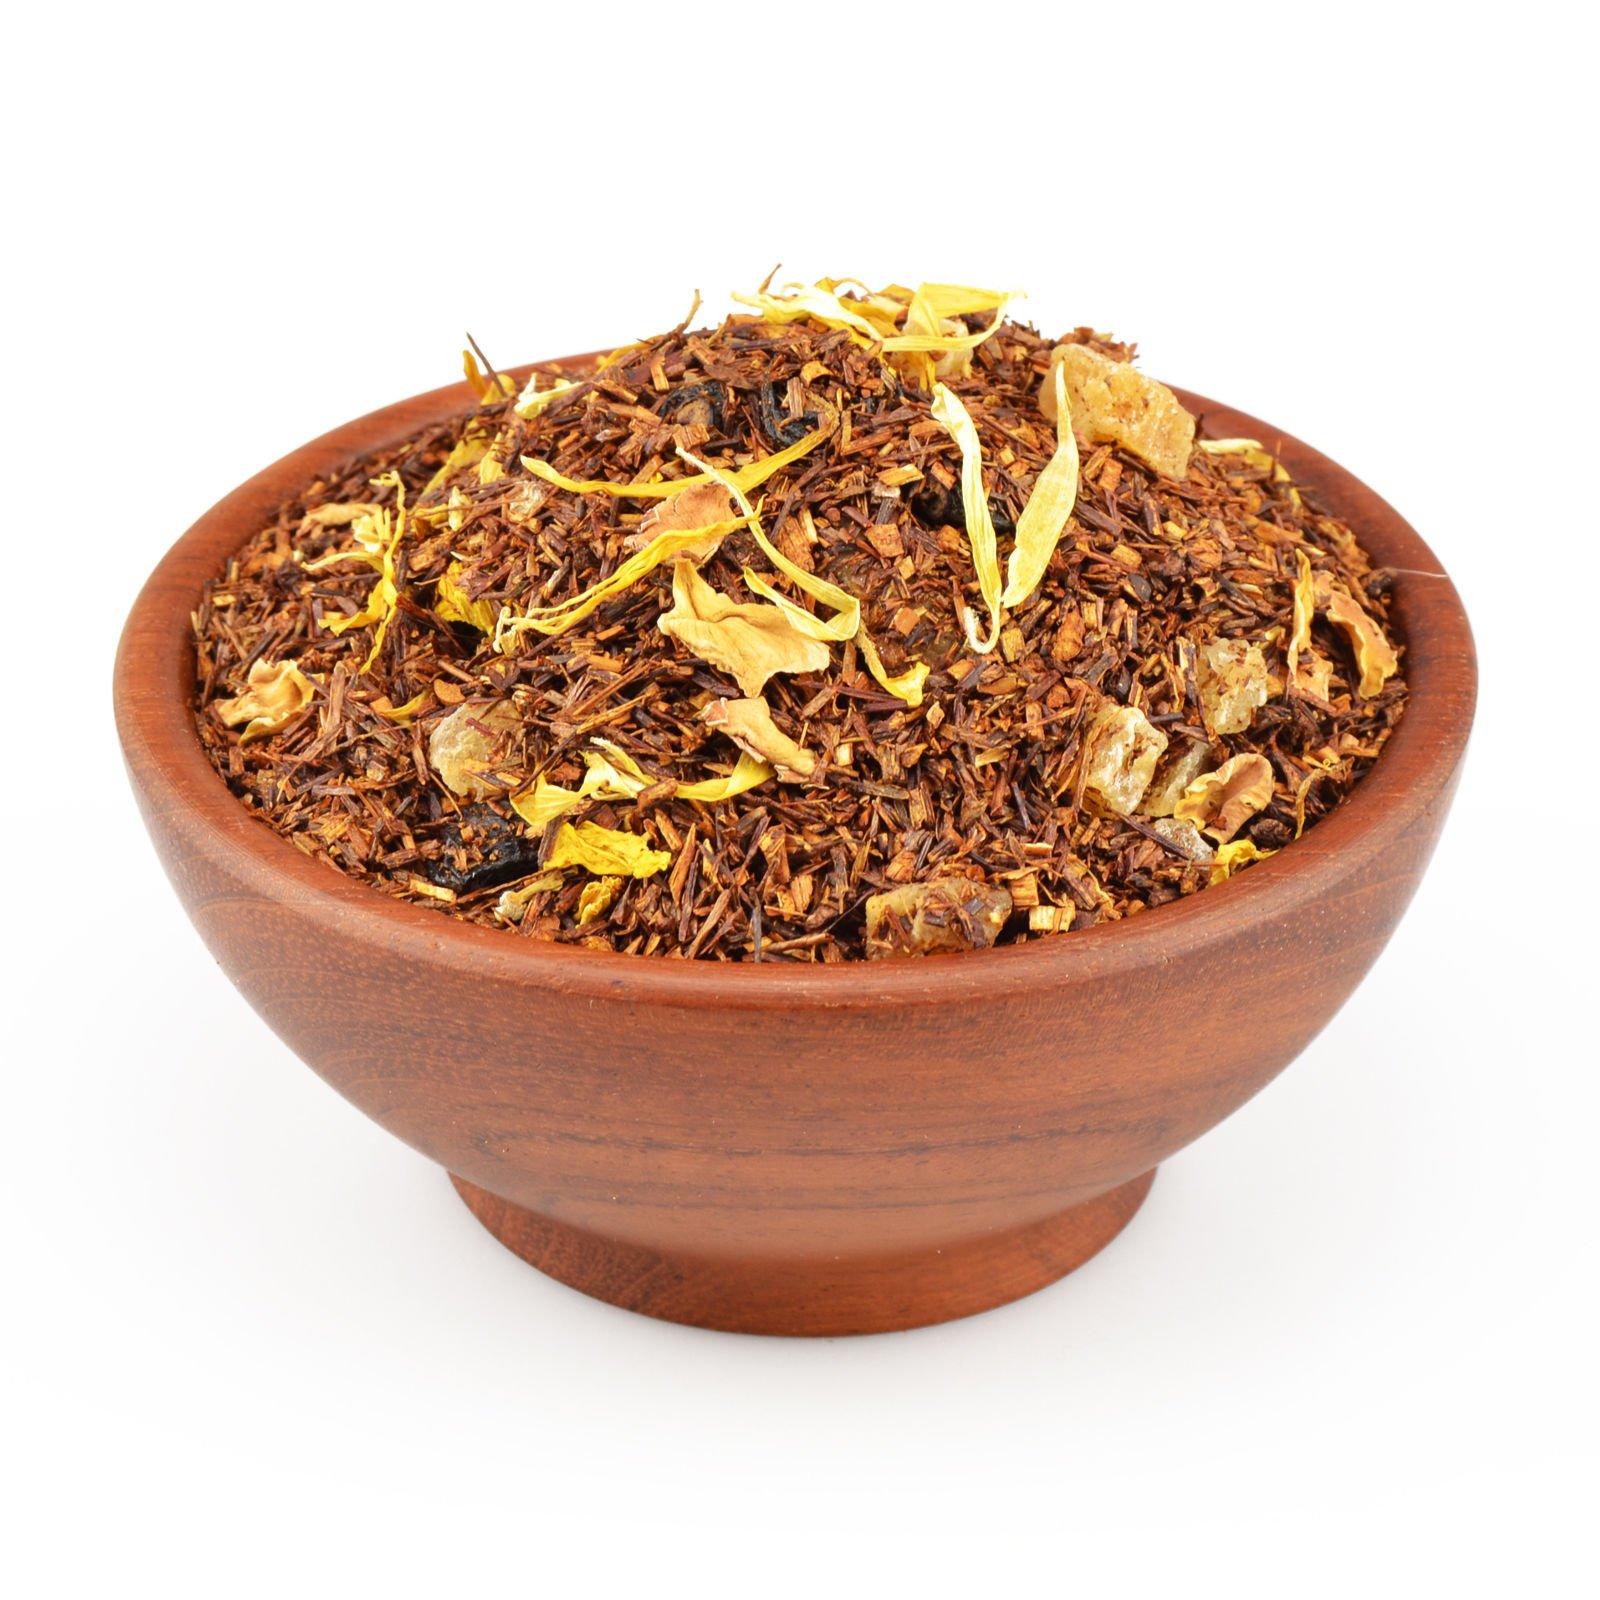 250g-Rooibos-Tee-Mango-Papaya-Aromatisiert-Rooibostee-Rotbusch-Loser-1A-Qualitt